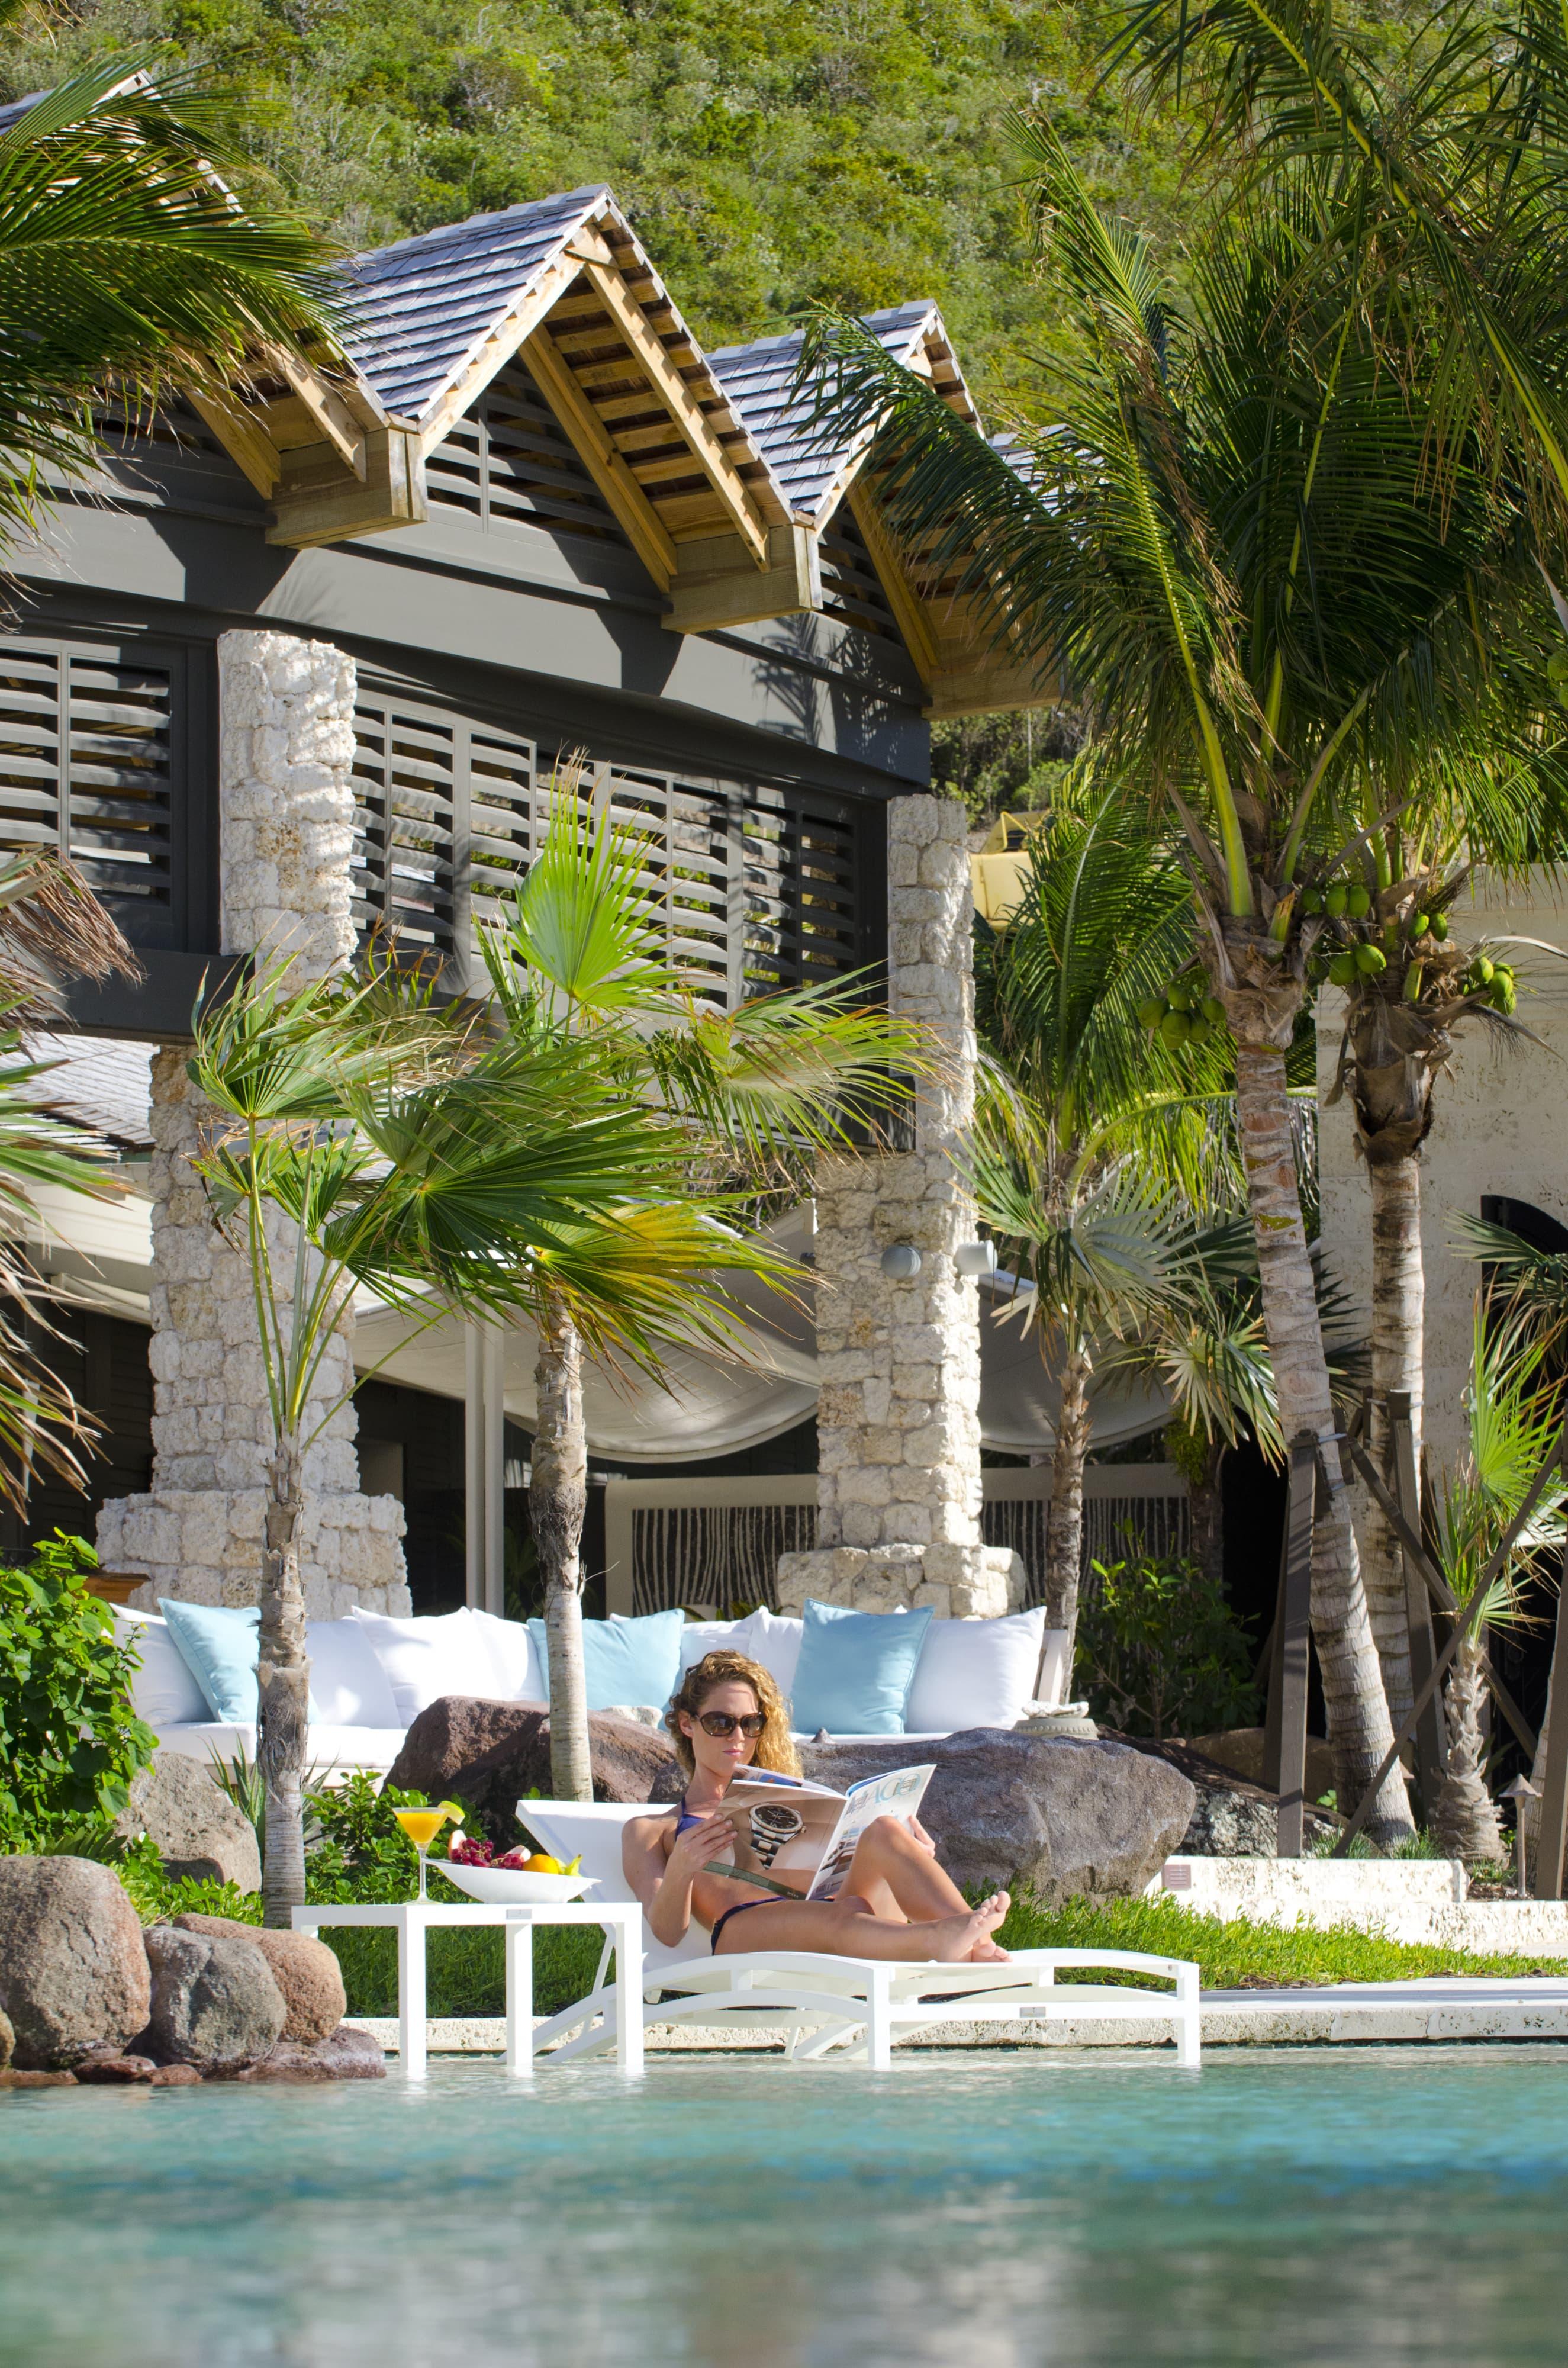 3. St. Kitts Experience-min